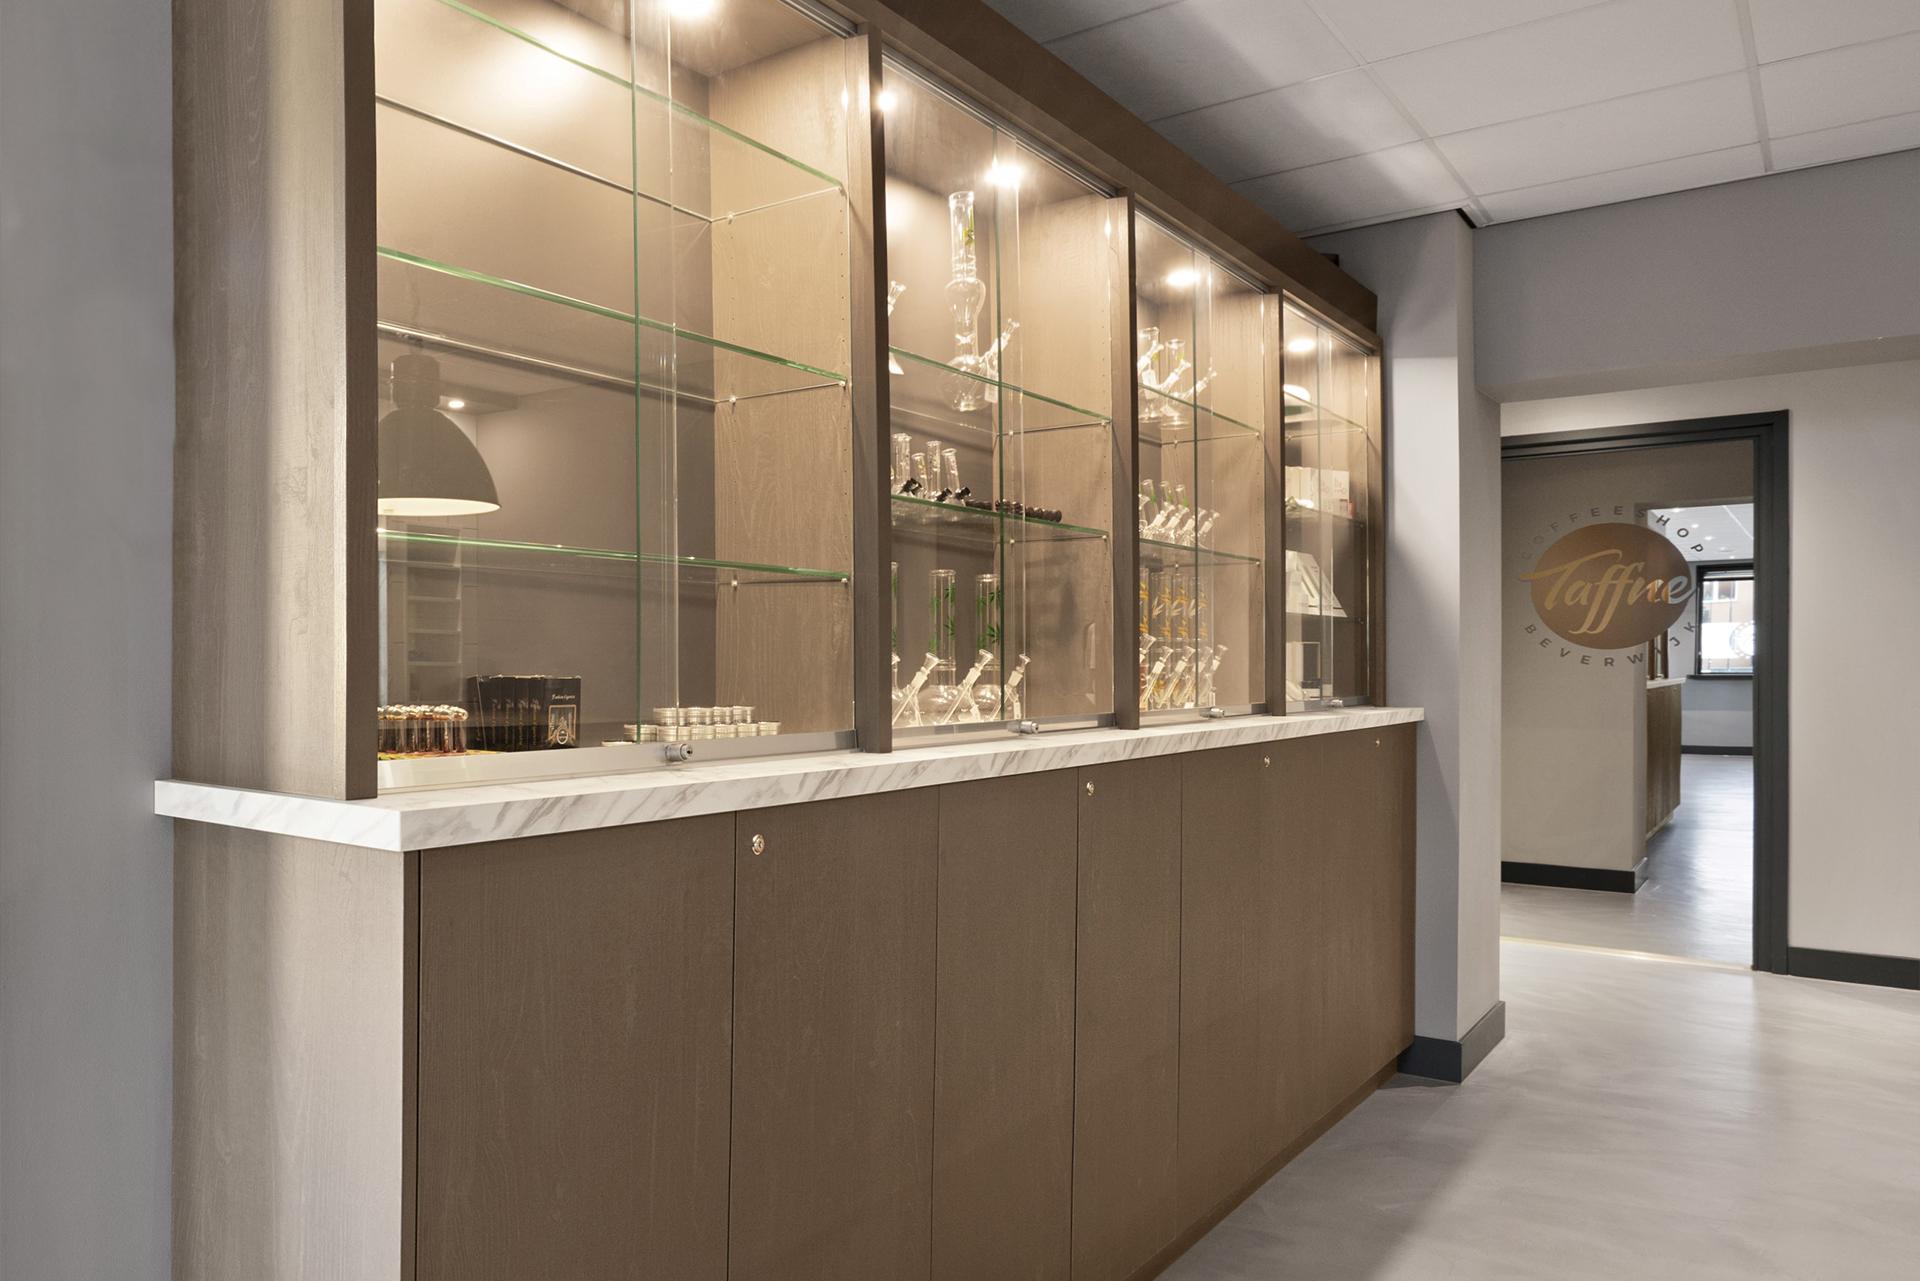 Adrichem Interieurbouw wandkast wandmeubel design